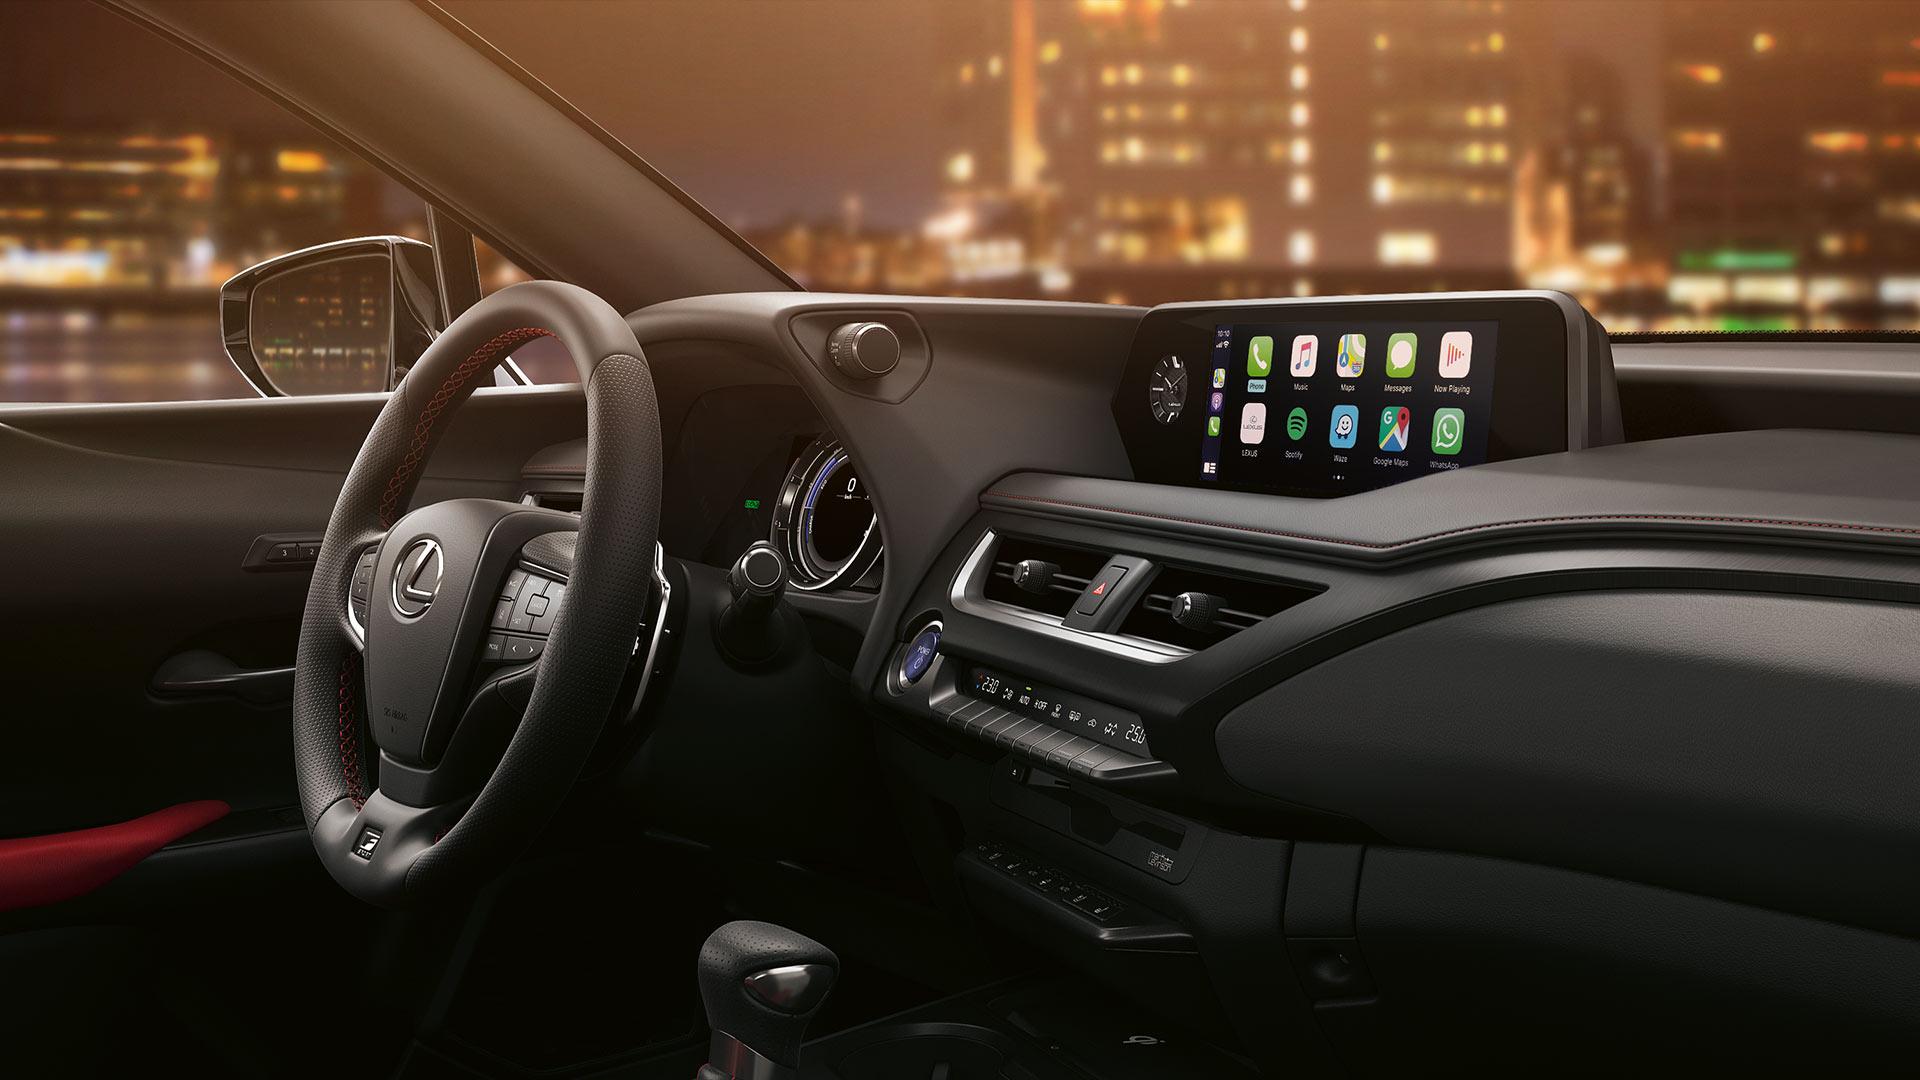 apple car play androrid auto desktop 1